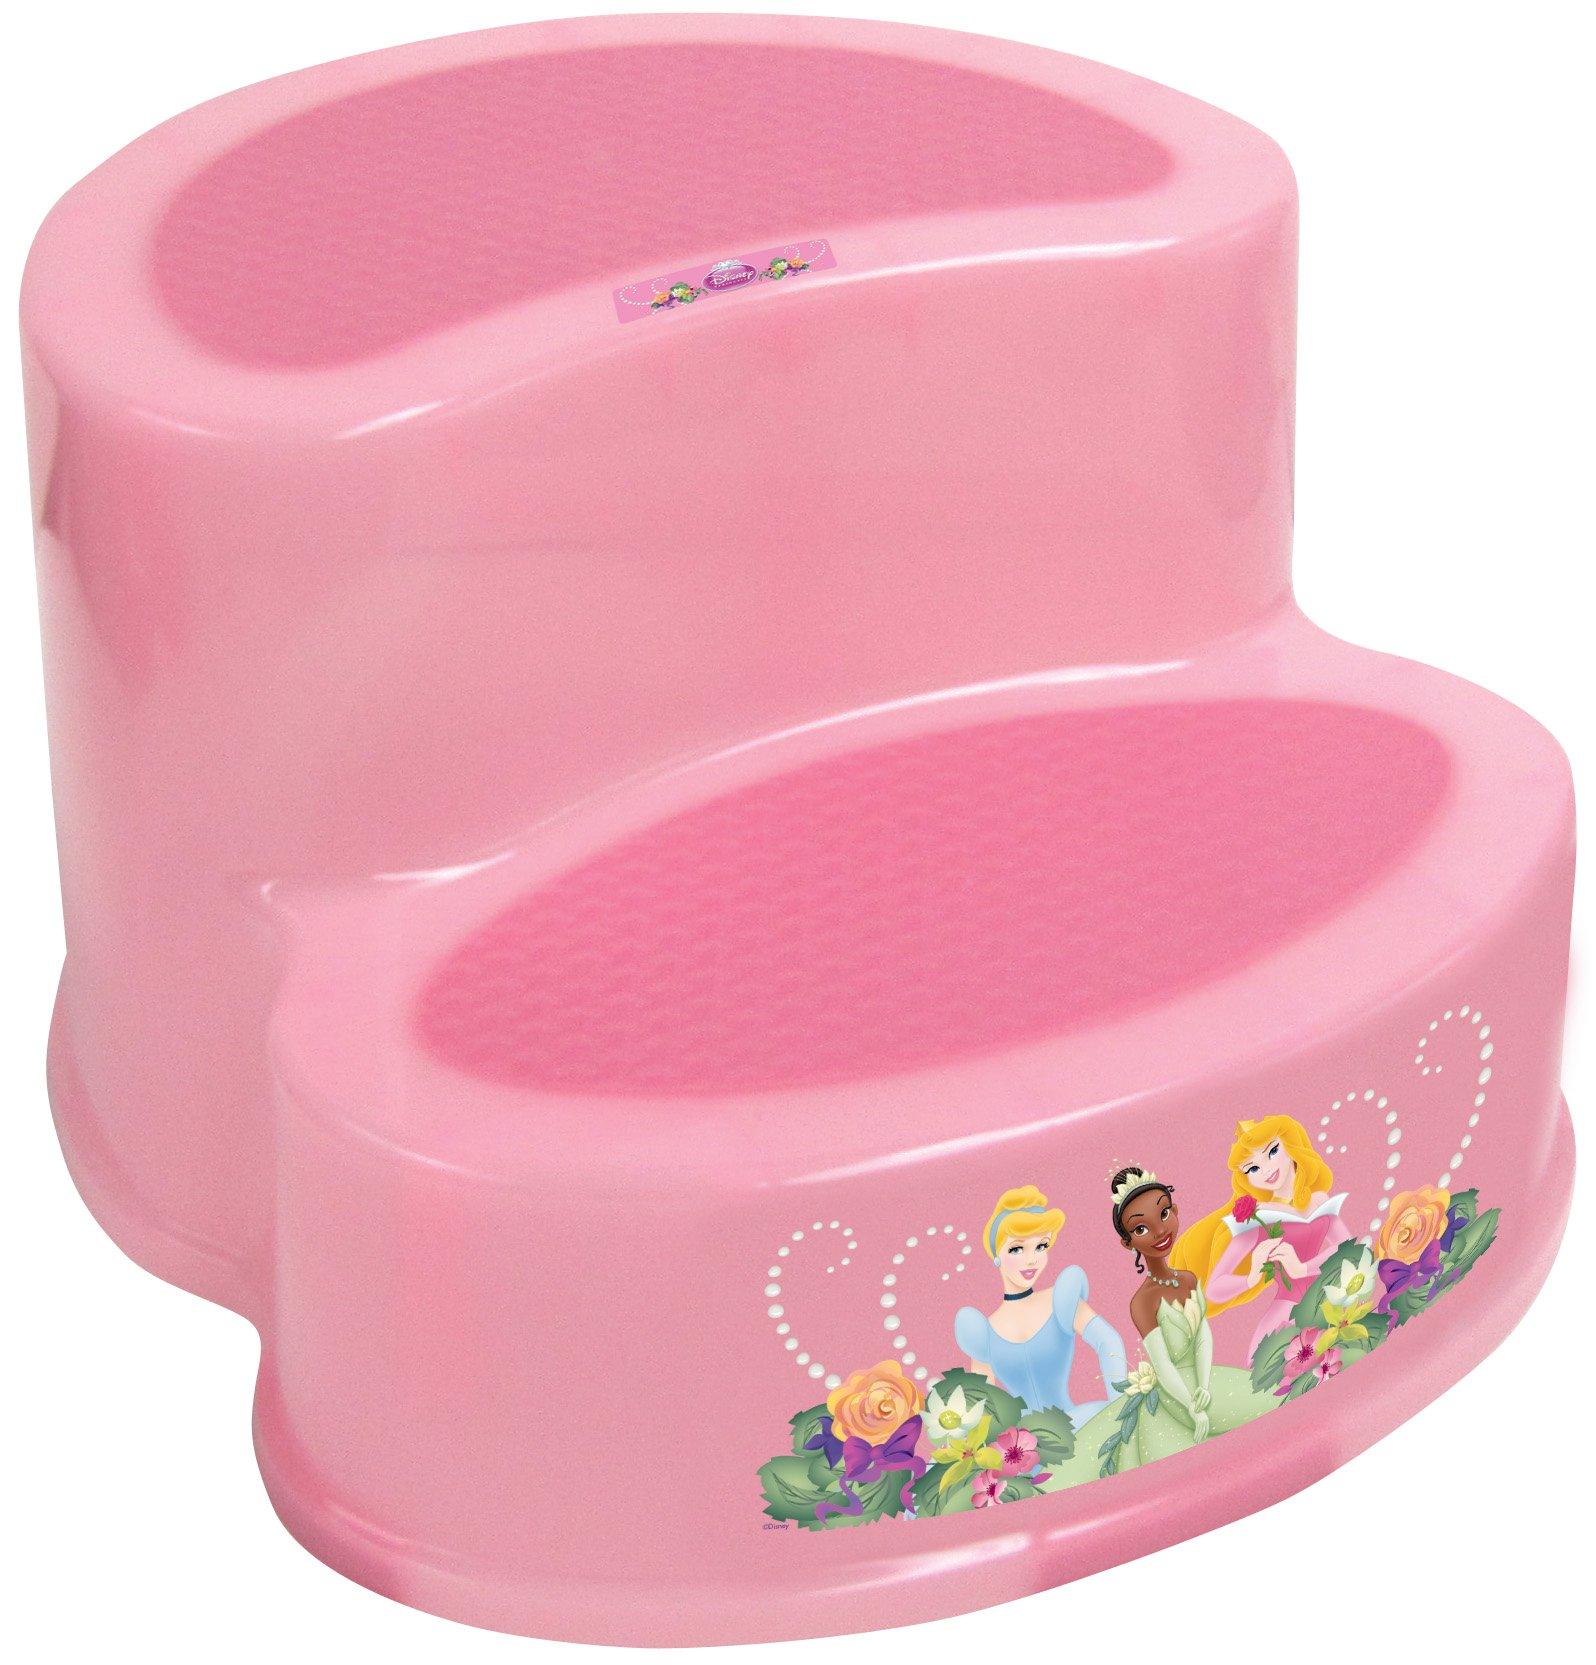 Amazon Com Disney Princess Soft Potty Seat With Handles